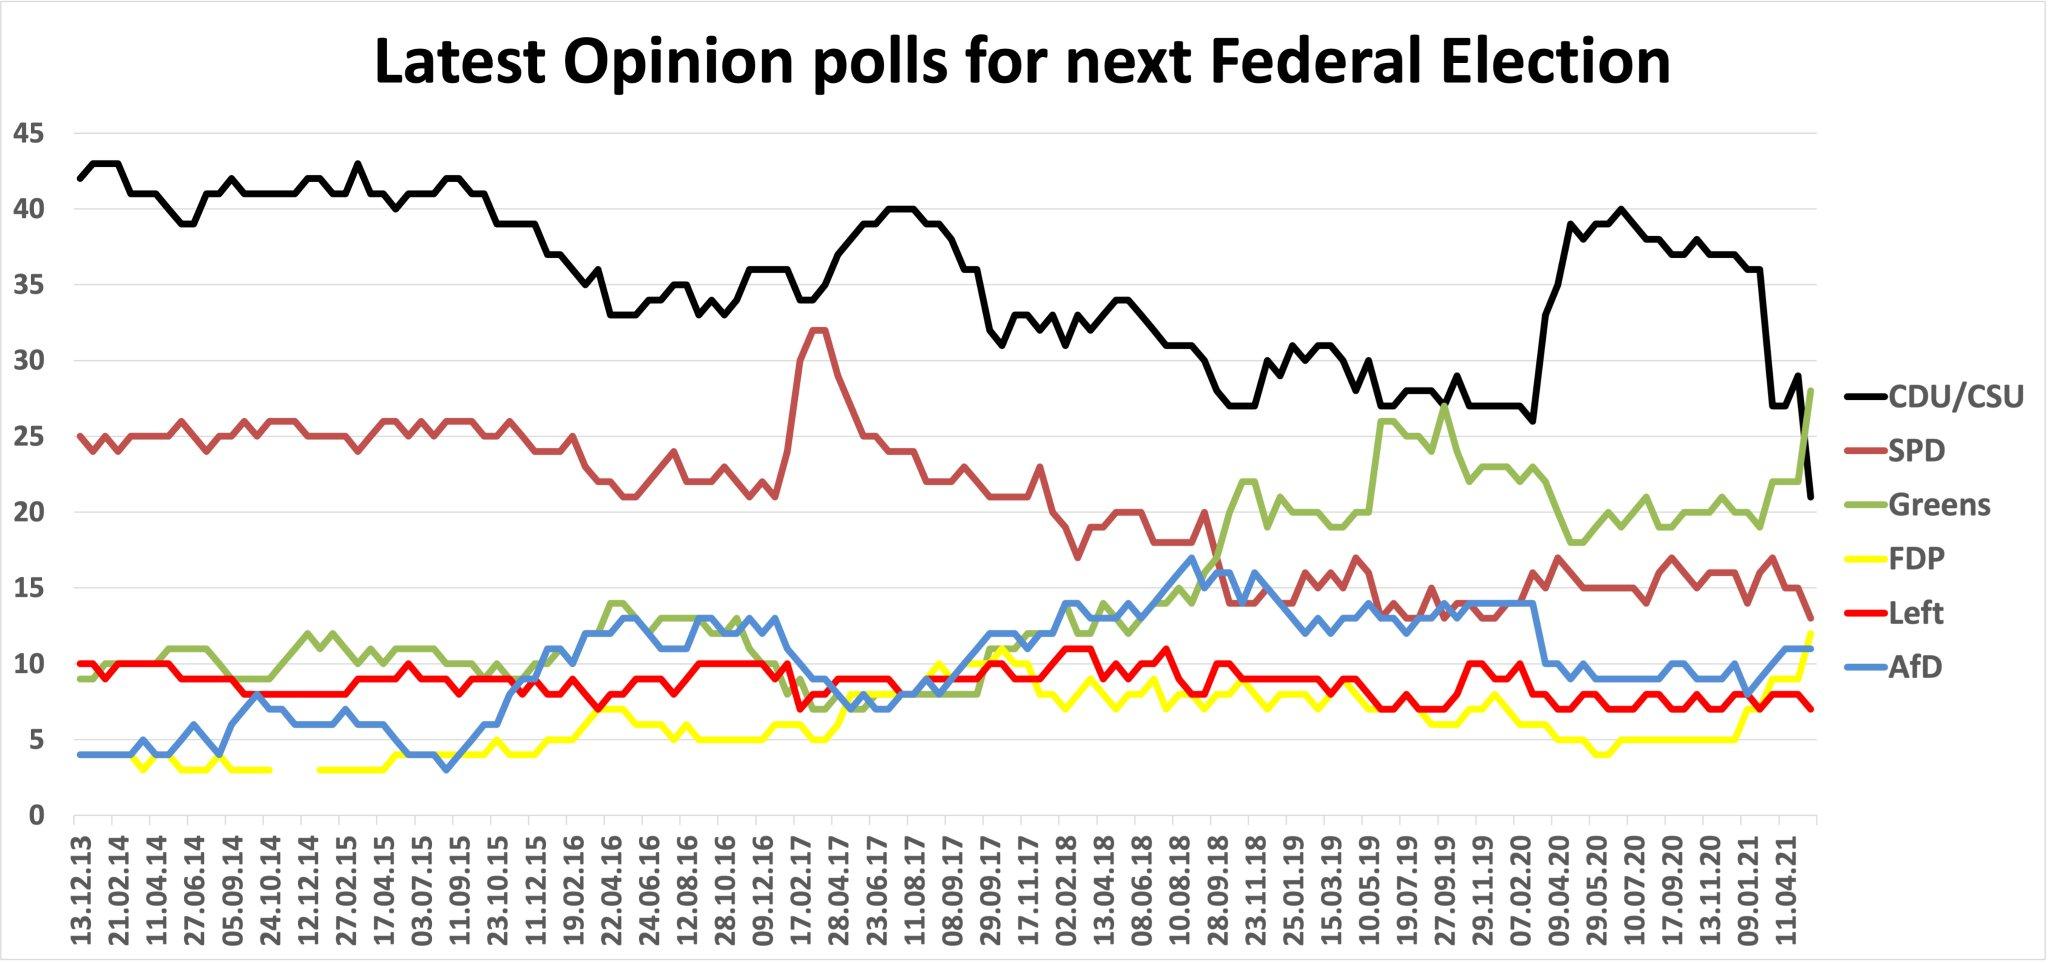 Angela Merkel's CDU crashes in polls - Greens might take control of Chancellorship